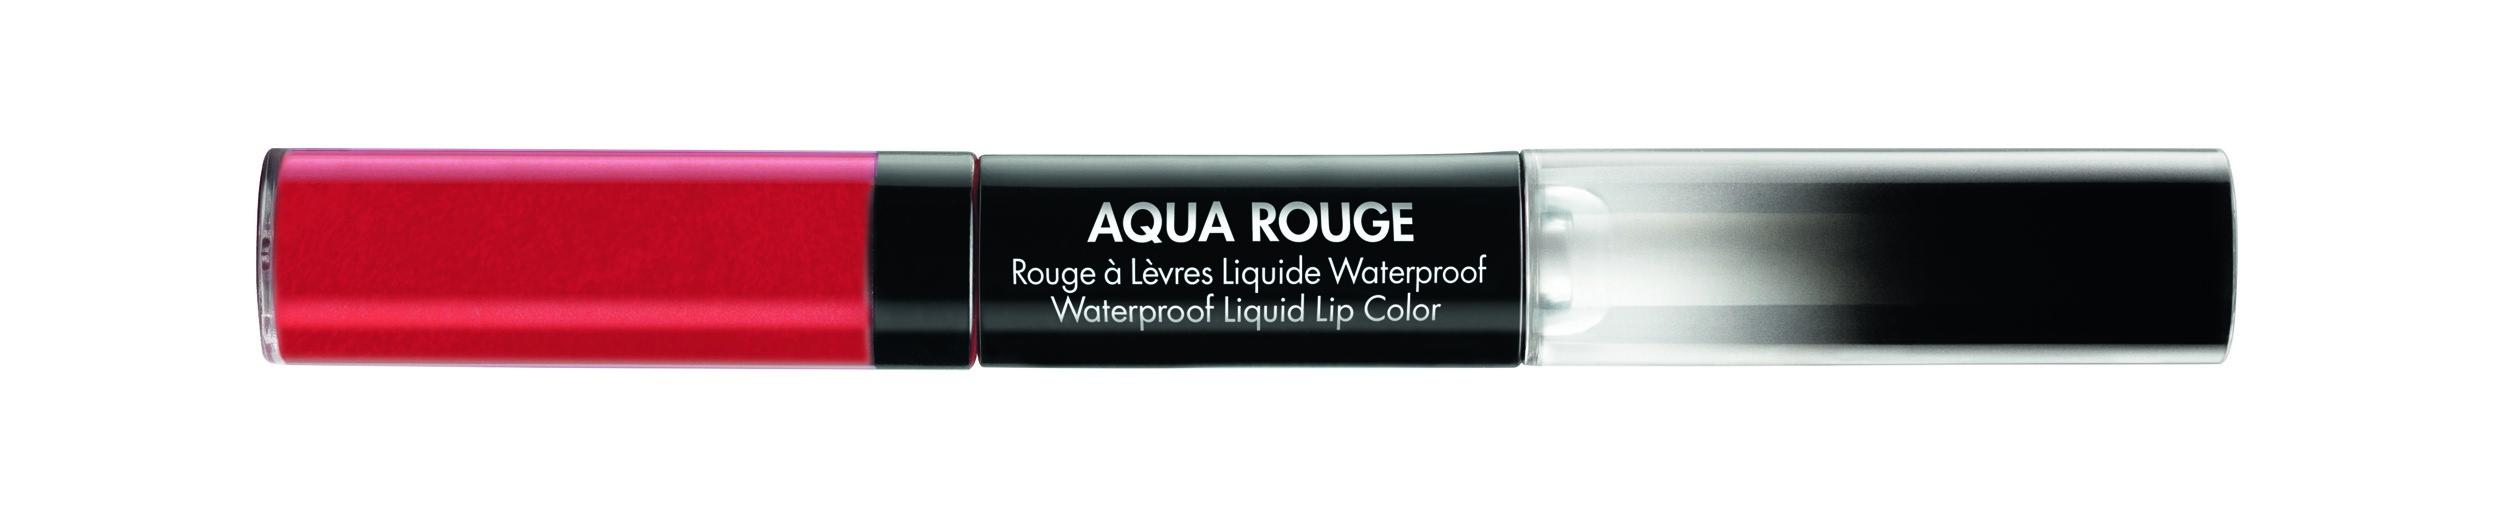 Makeup forever aqua rouge